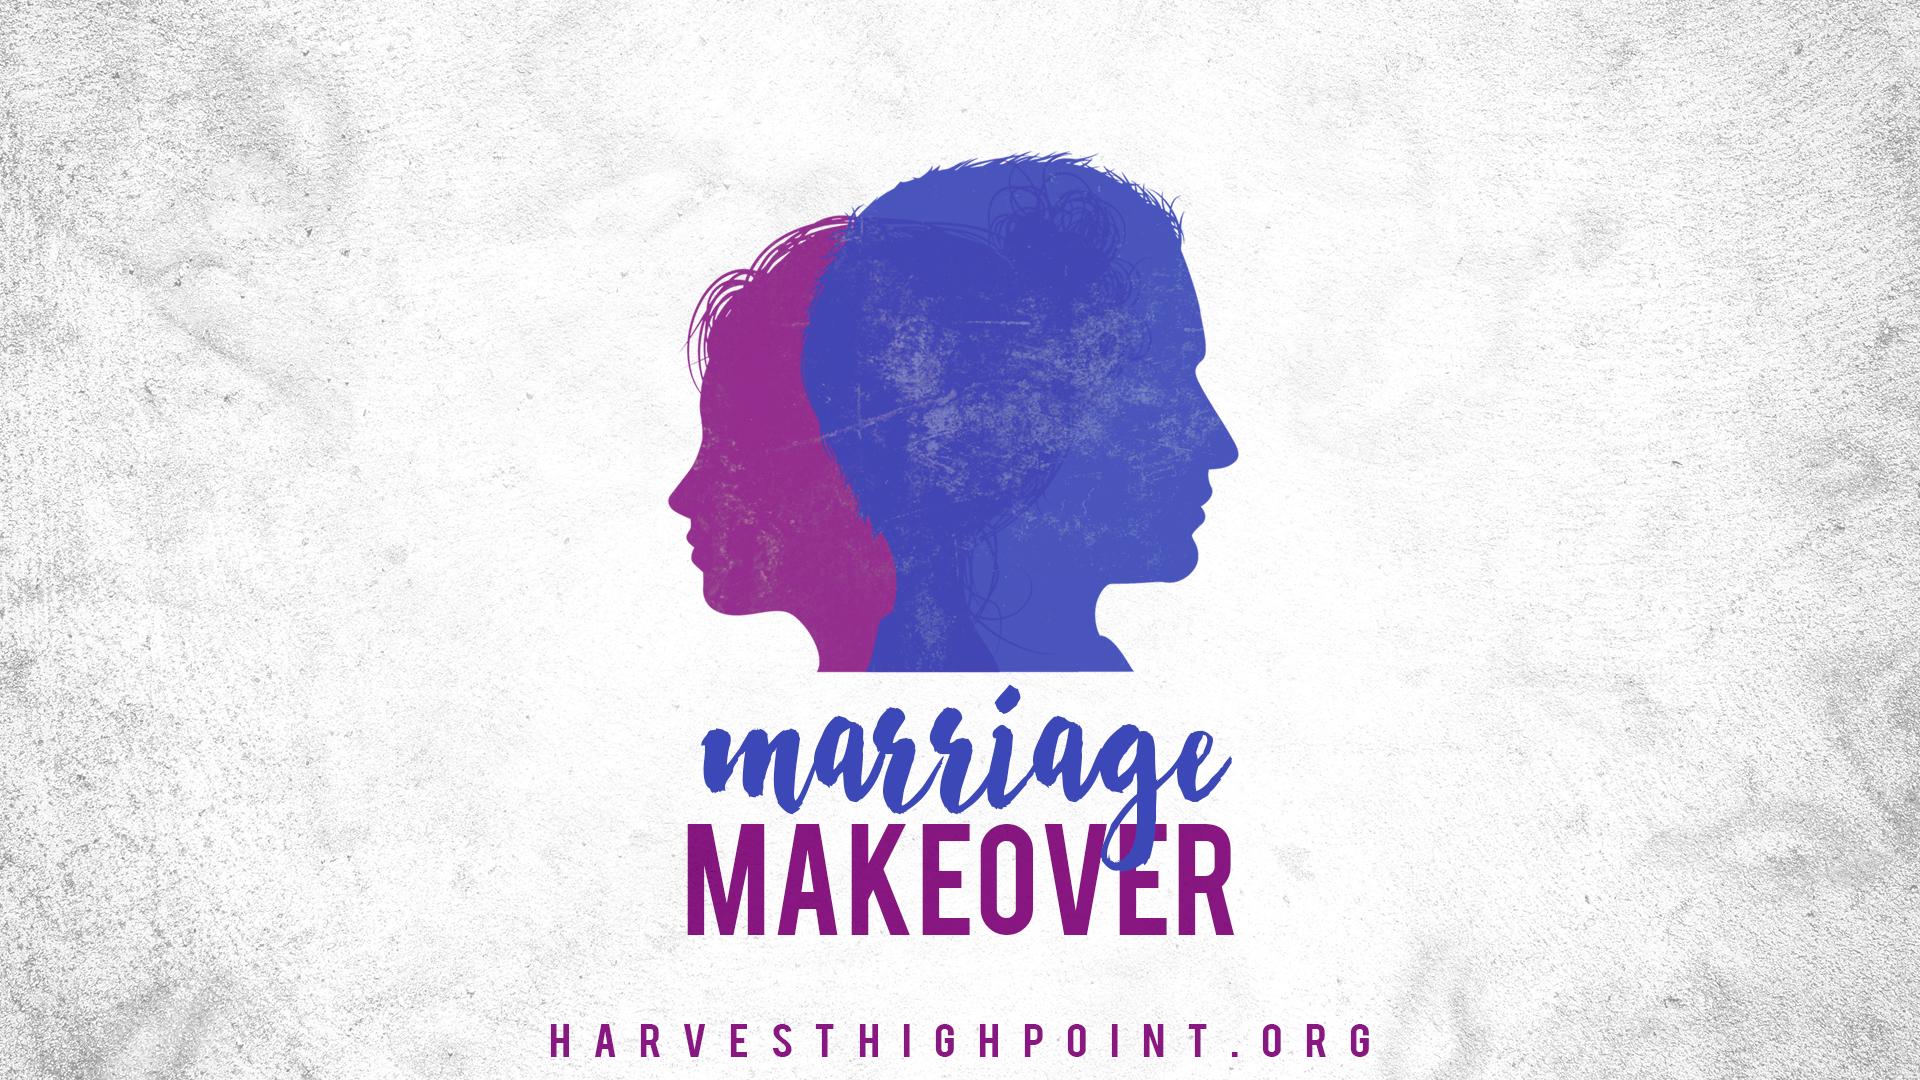 MarriageMattersWeb.jpg